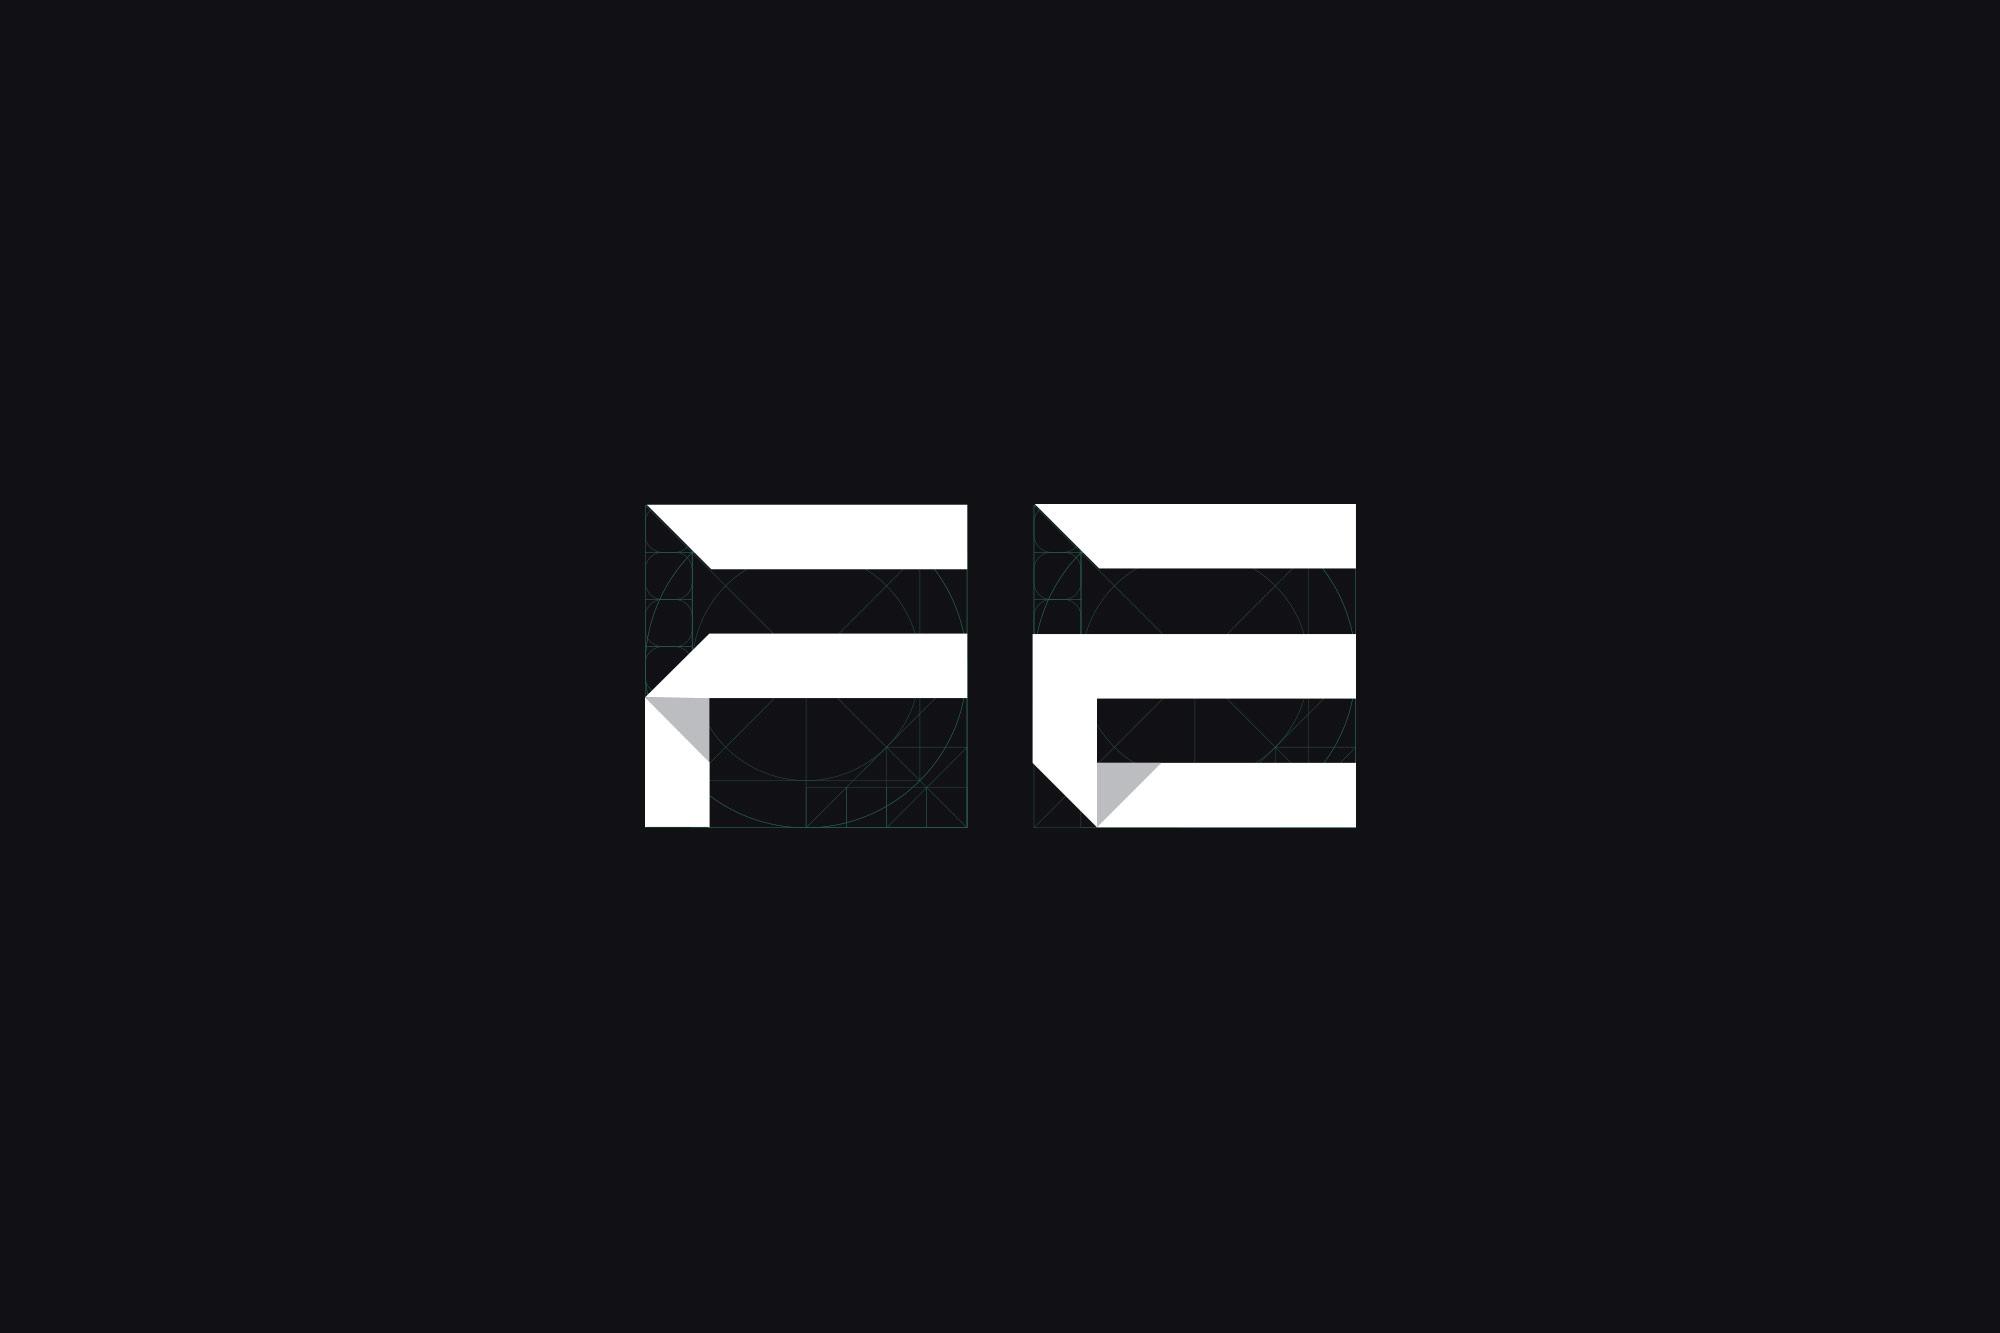 gareth-paul-jones-studio-music-design-future-engineers-branding-cs-02